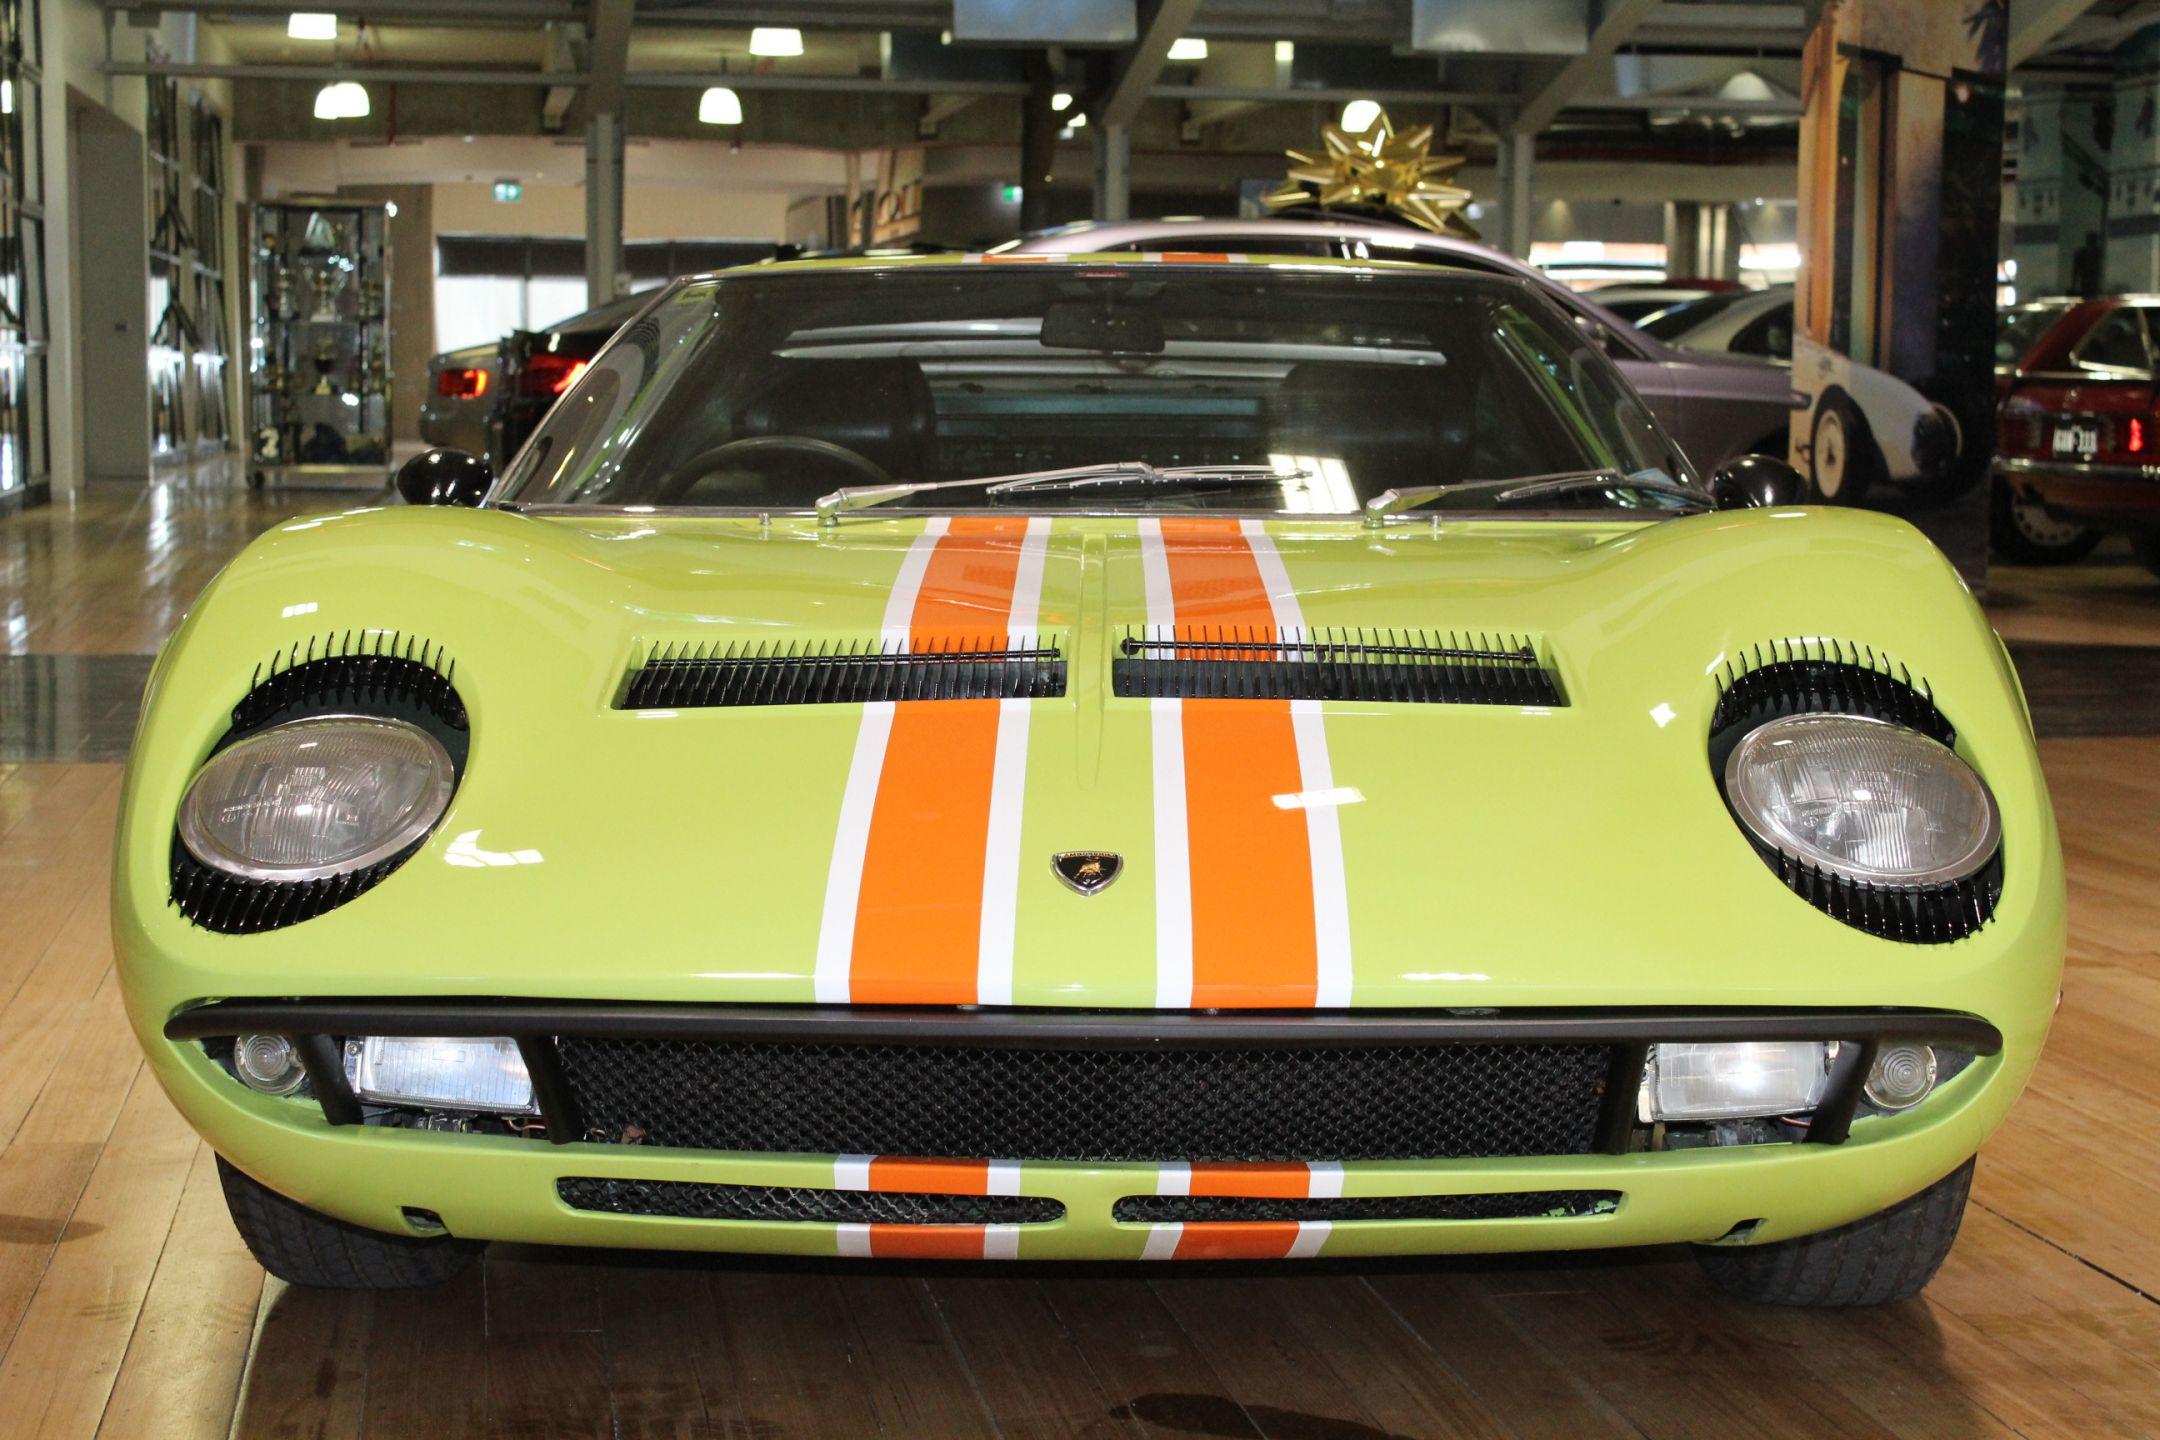 1969 Lamborghini Miura S Twiggy For Sale Duttongarage Com